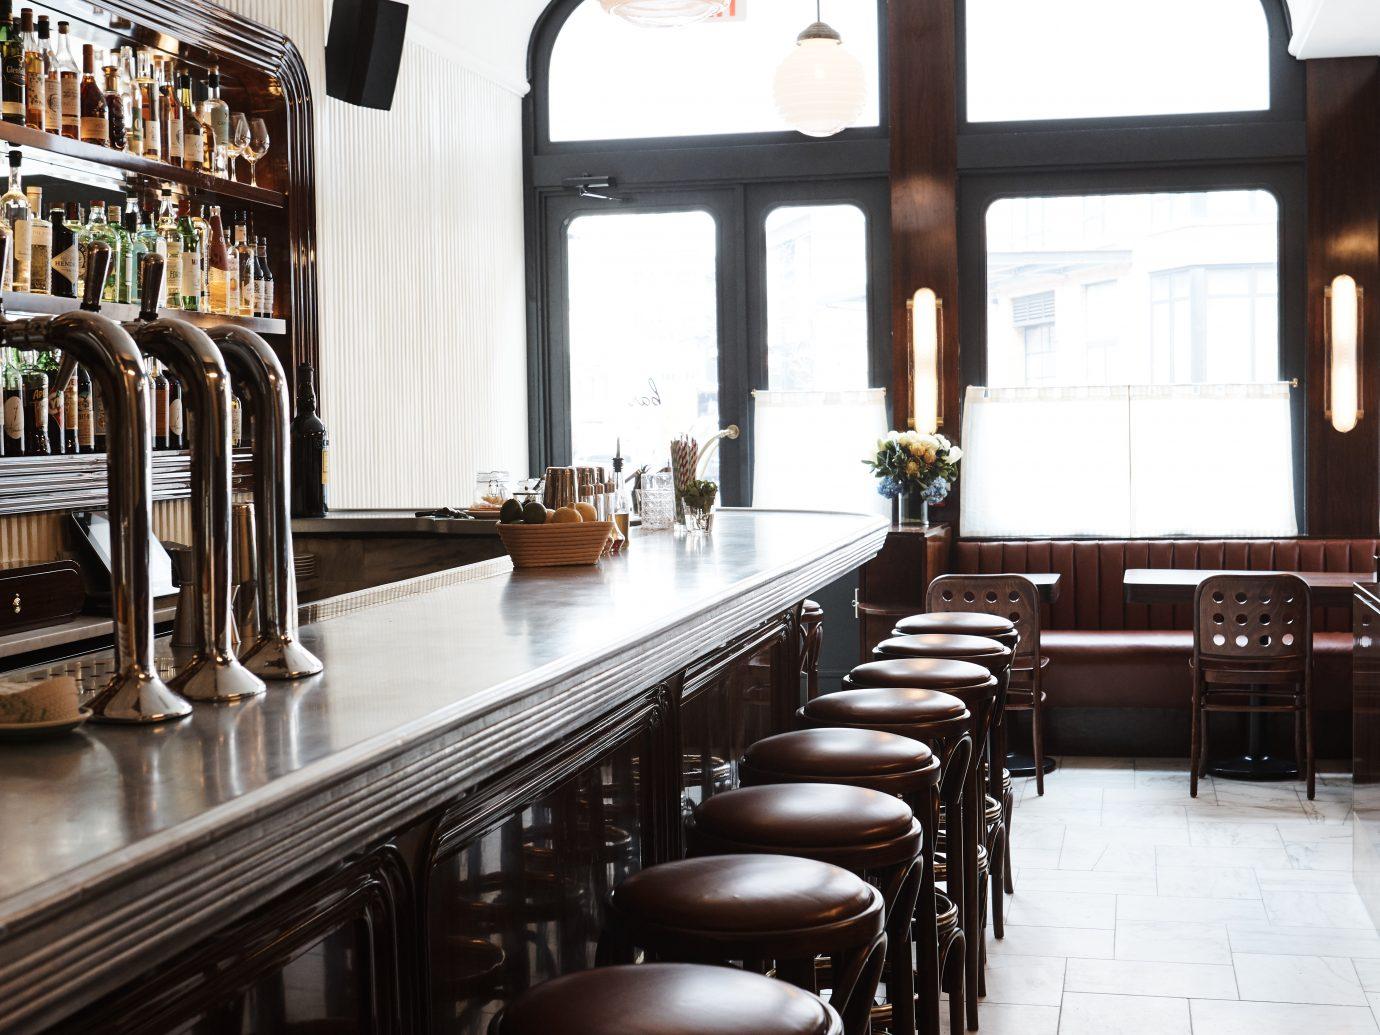 Frenchette bar